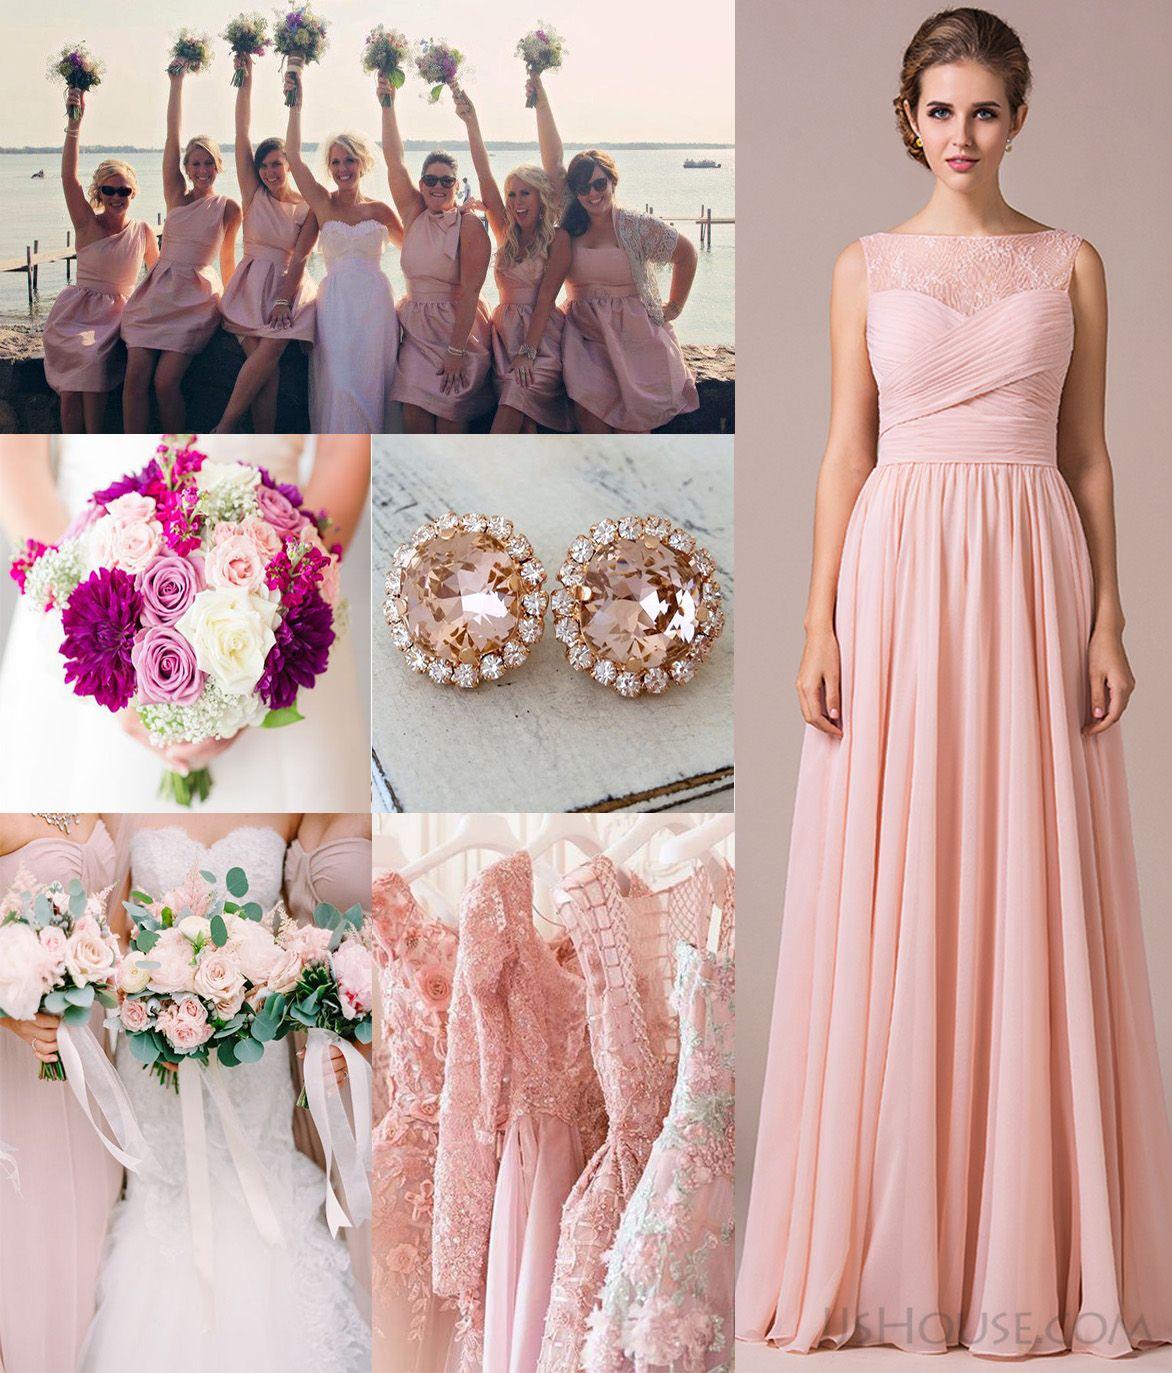 a5ad9656a90f Blushing pink bridesmaid dress,every girl has a pink dream. #JJsHouse  #JJsHouseBridesmaidDress